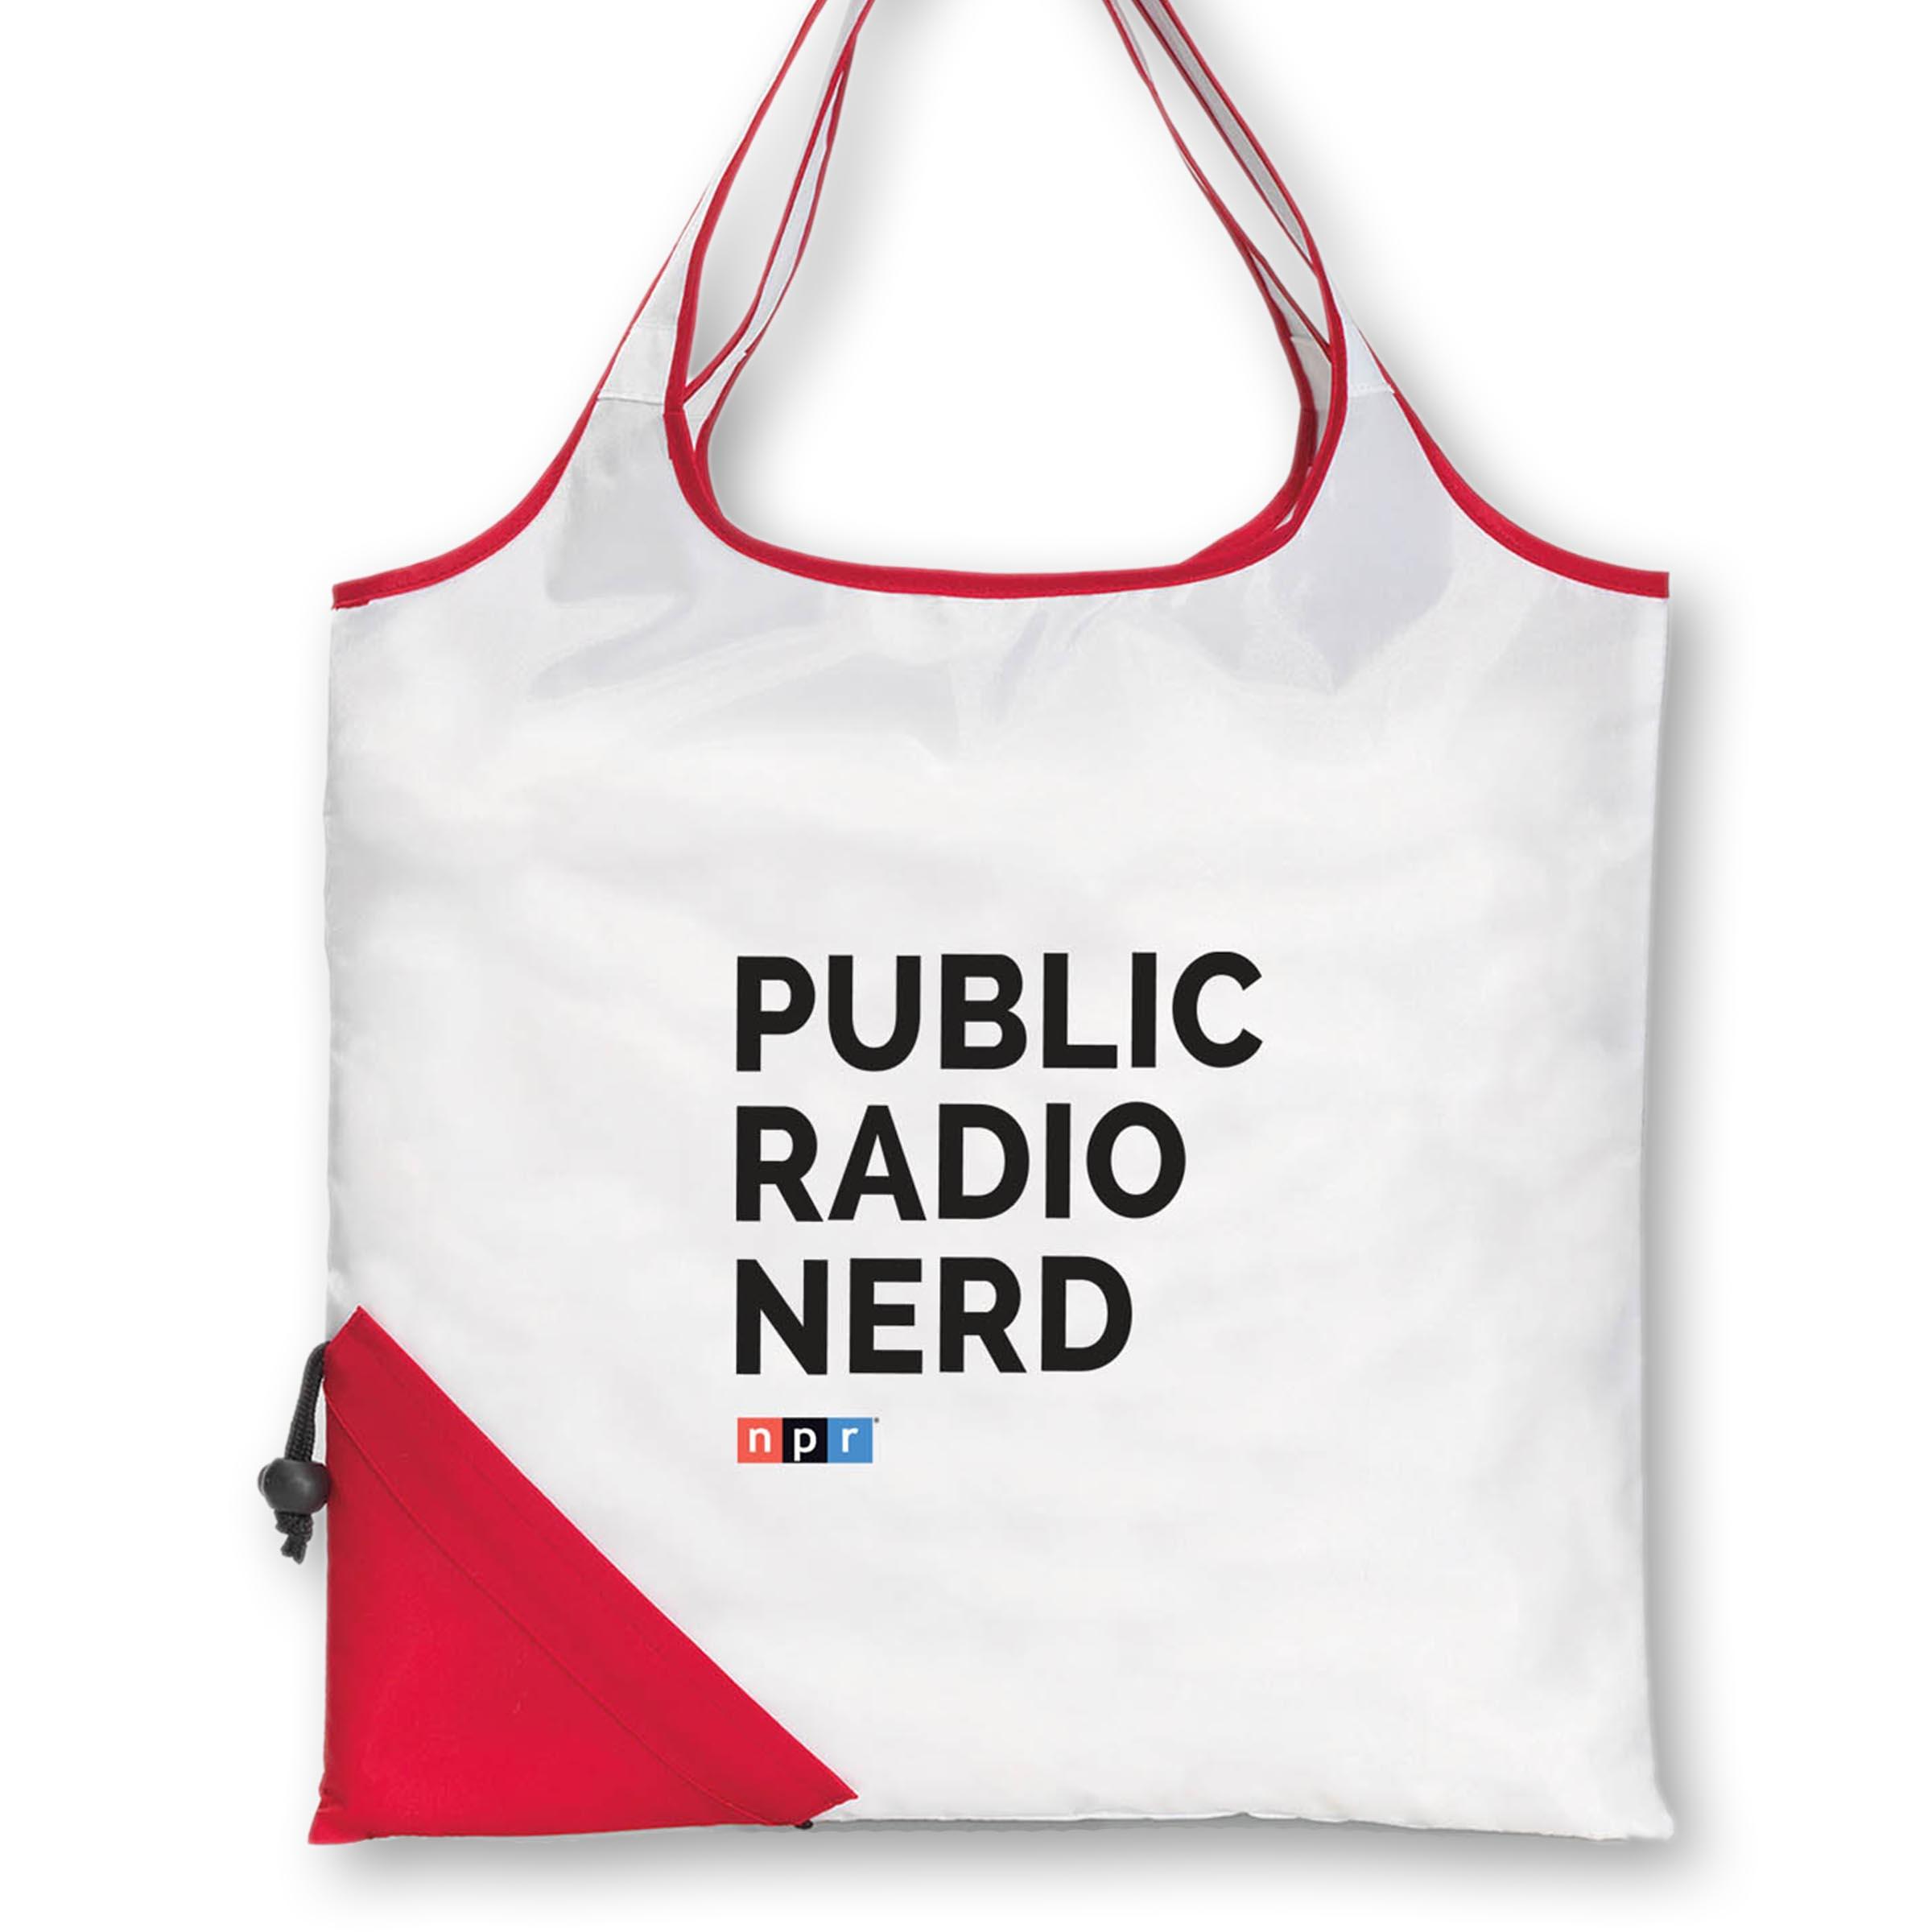 WBEZ Public Radio Nerd Tote